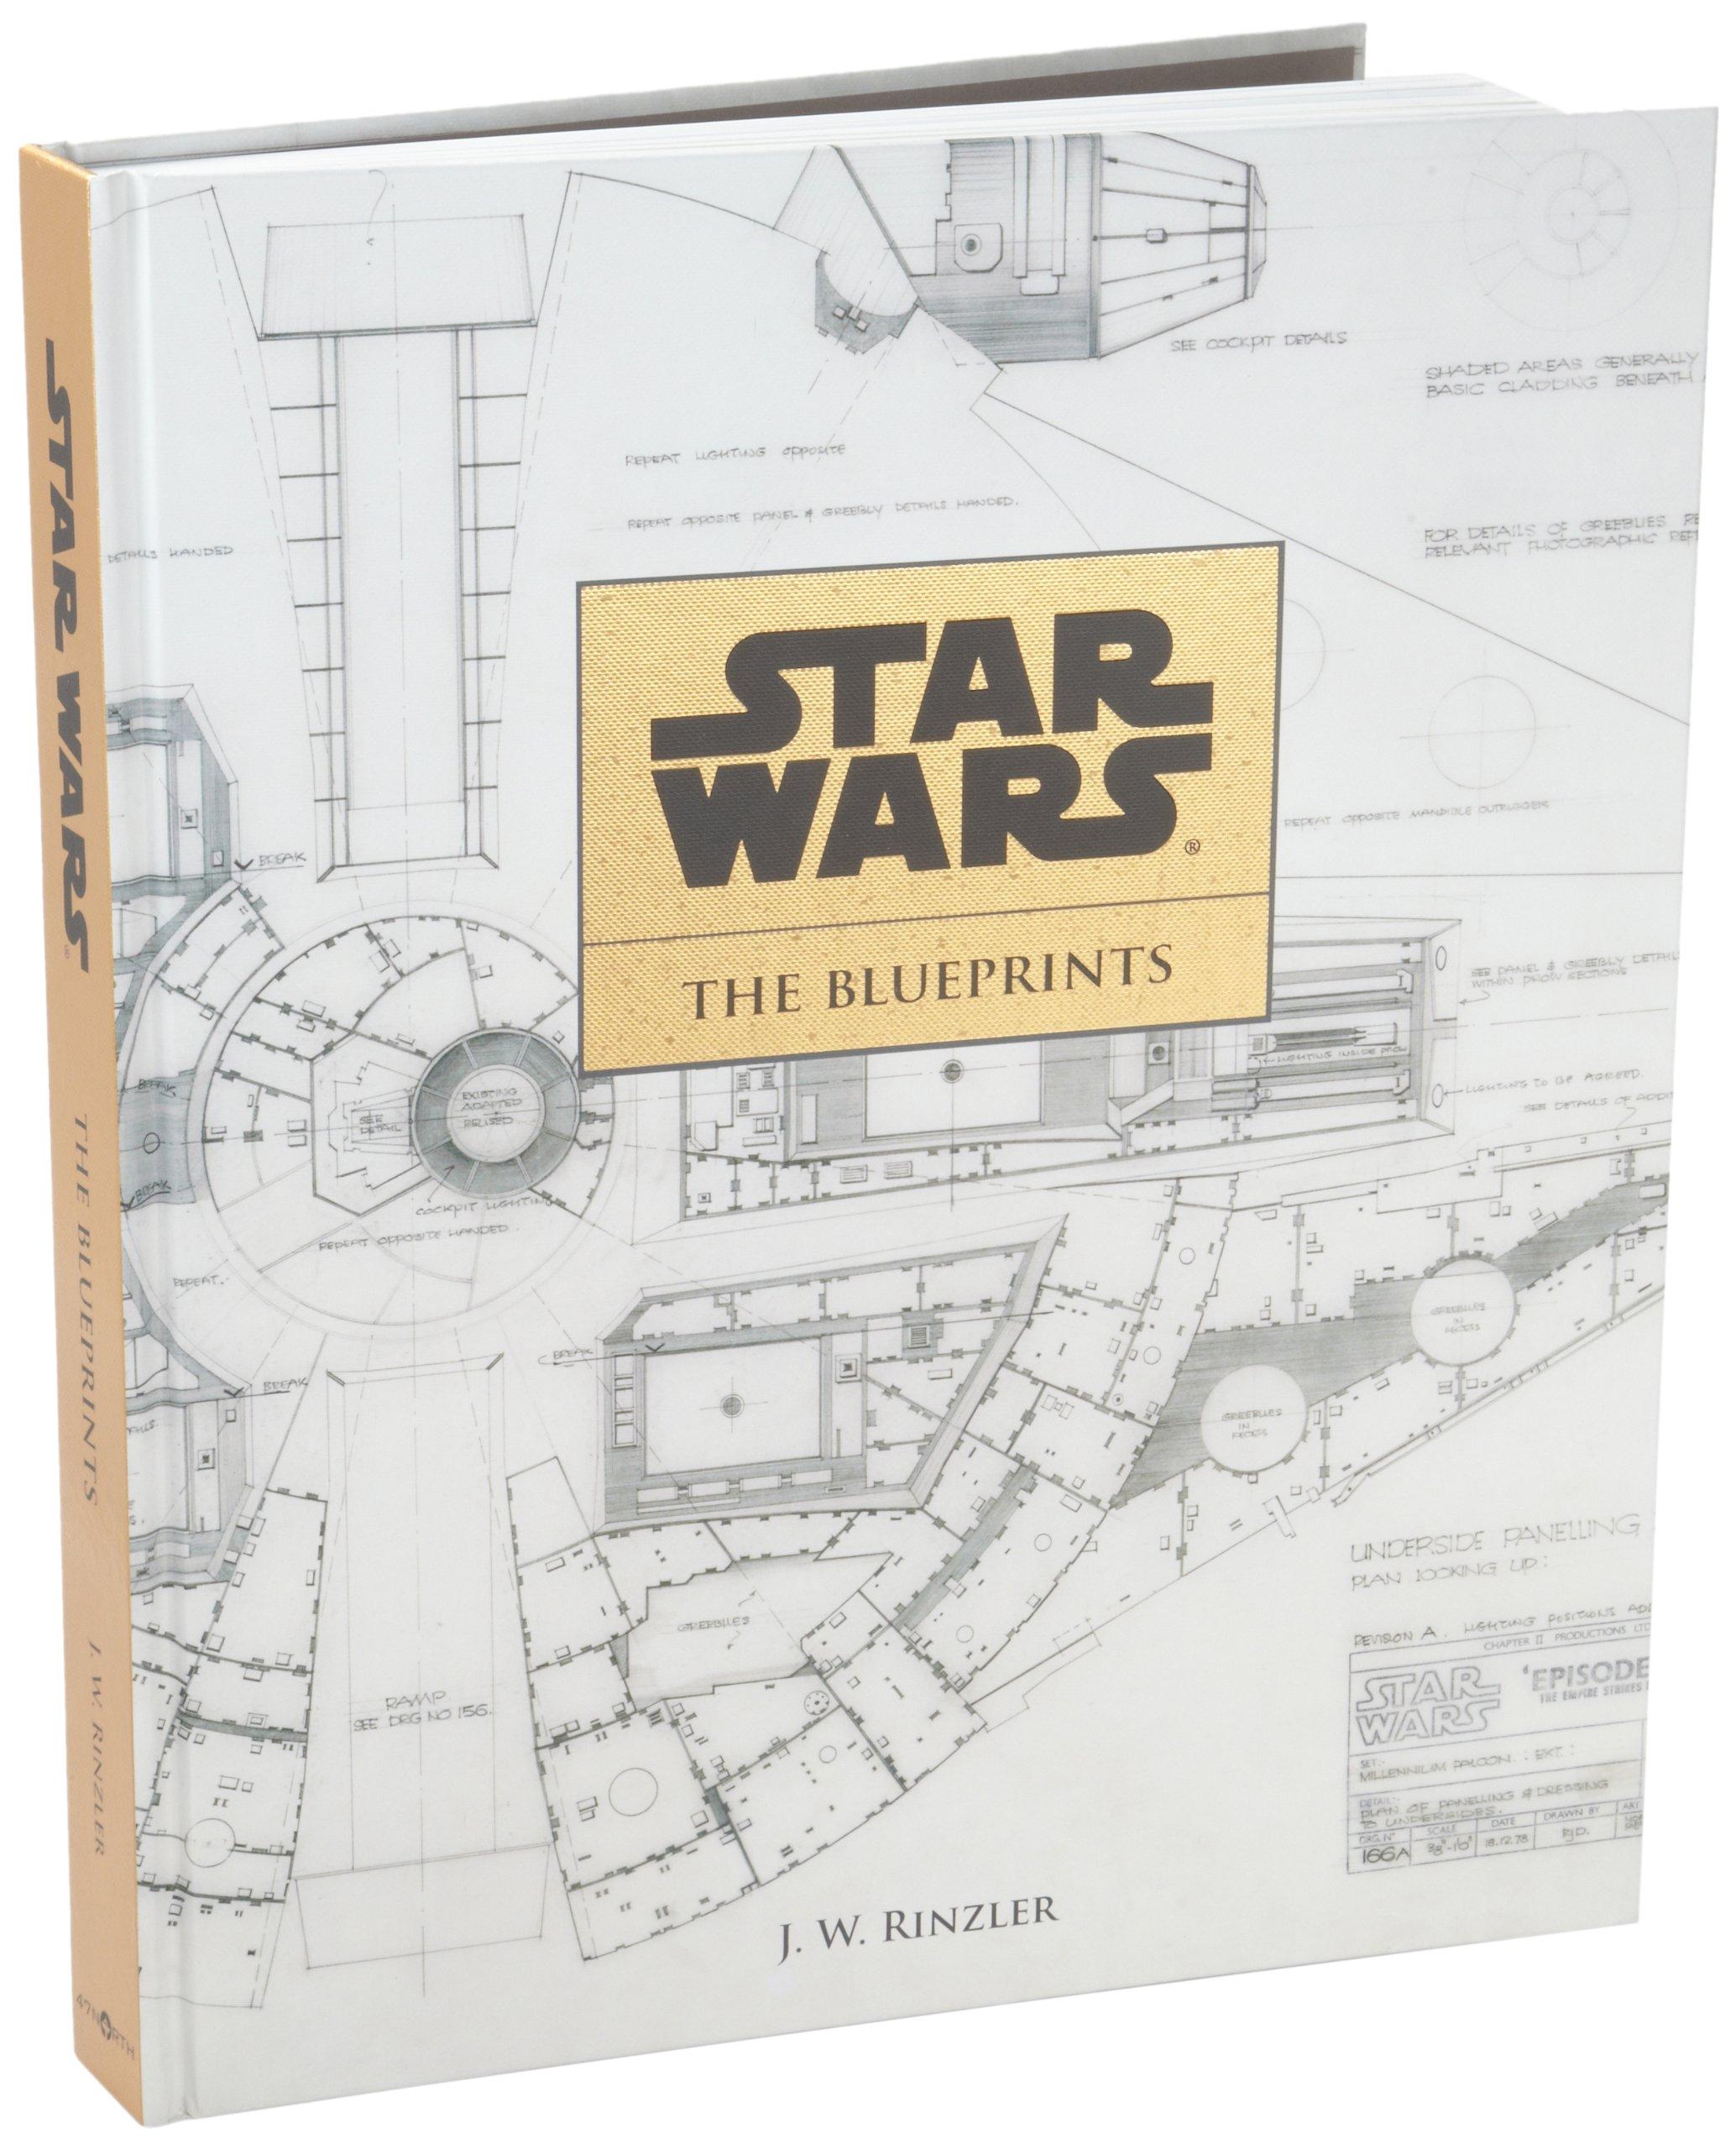 Star wars blueprints pdf dolapgnetband star wars blueprints pdf malvernweather Gallery